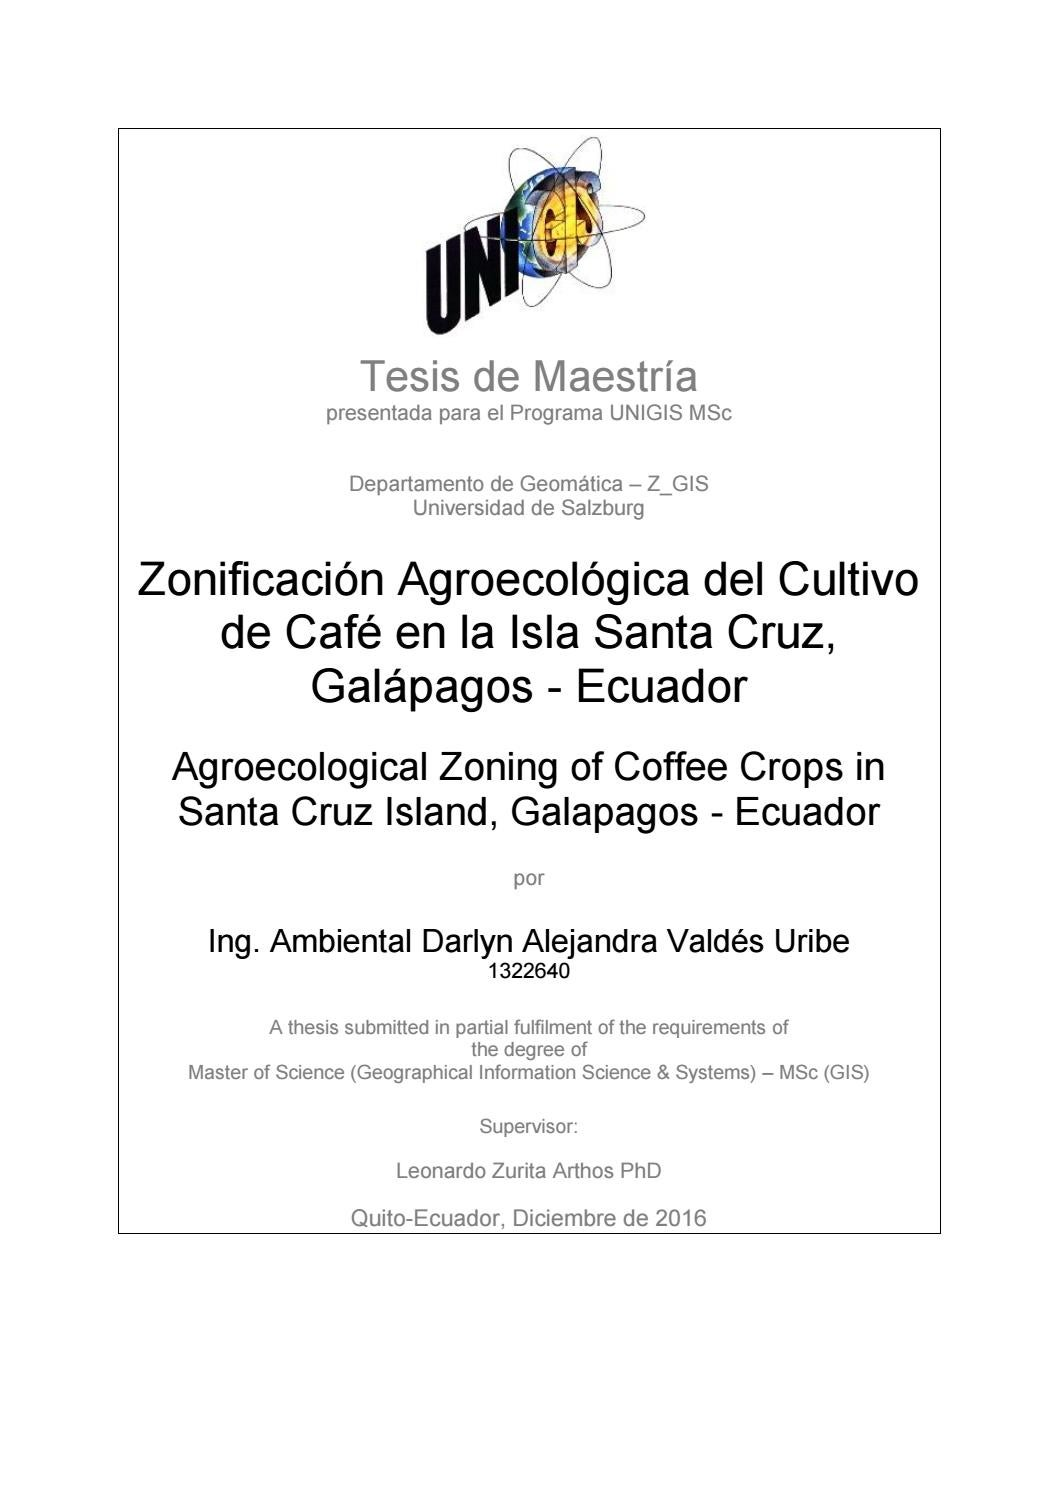 Agroecological Zoning Of Coffee Crops In Santa Cruz Island